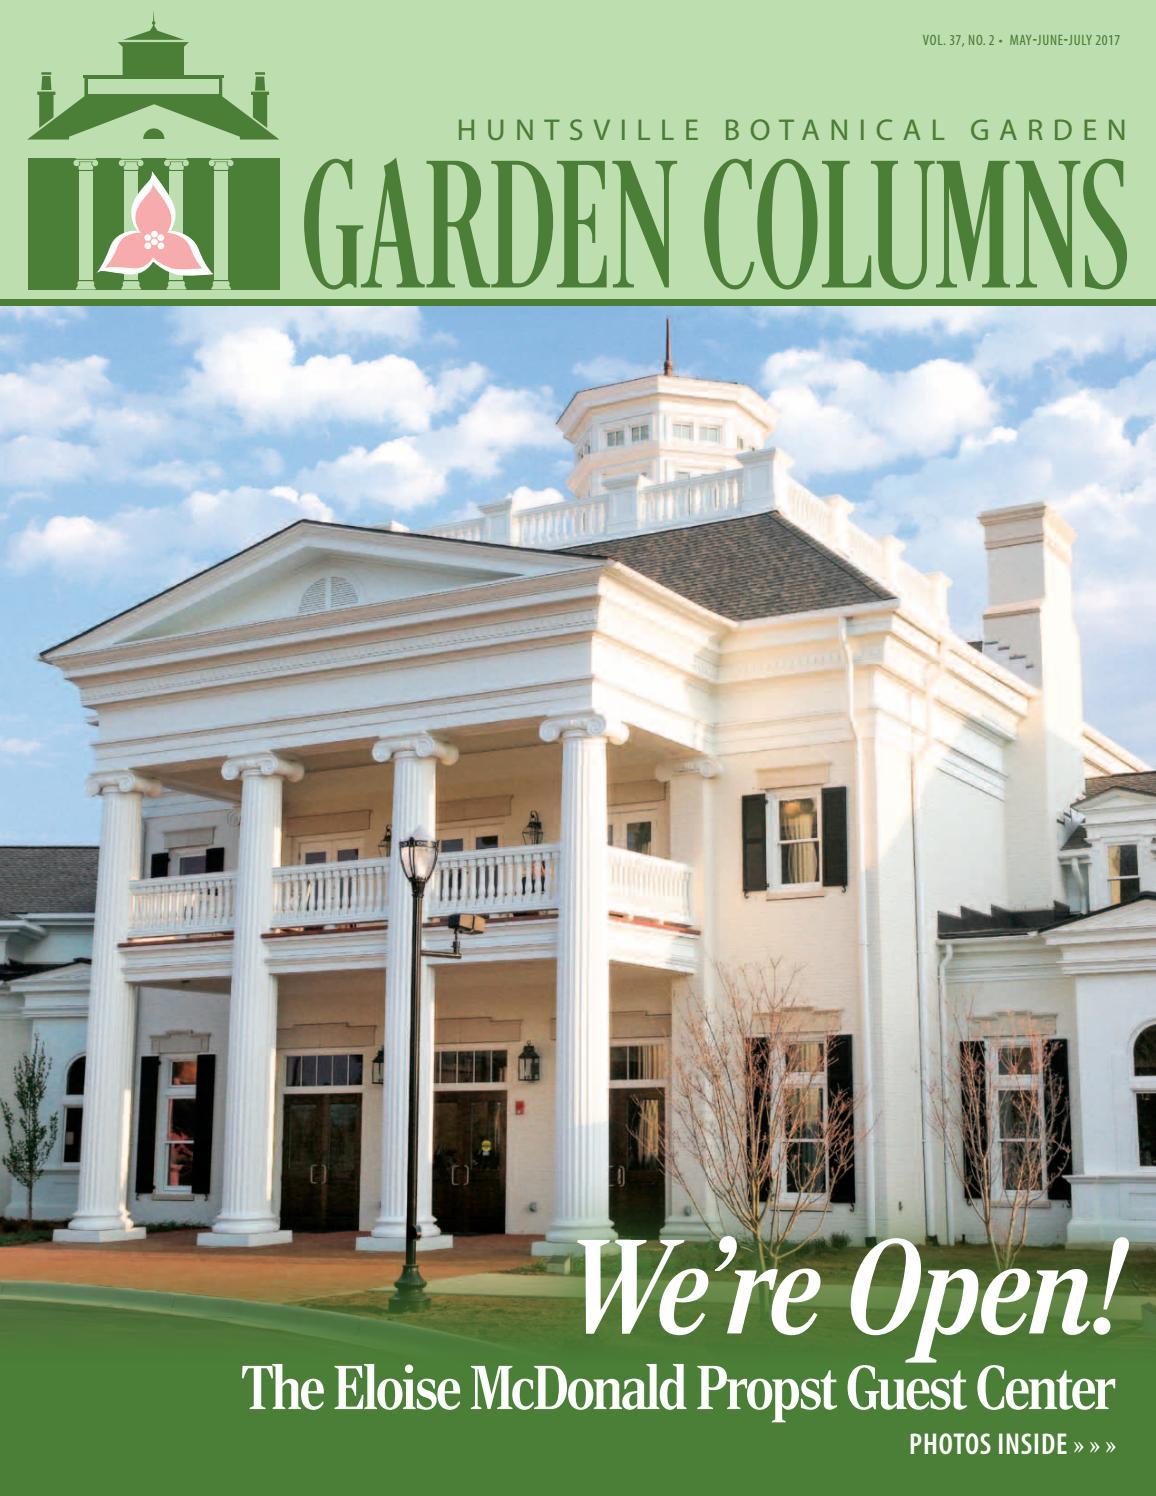 Hbg garden columns may june july 2017 by huntsville botanical garden issuu for Huntsville botanical gardens hours